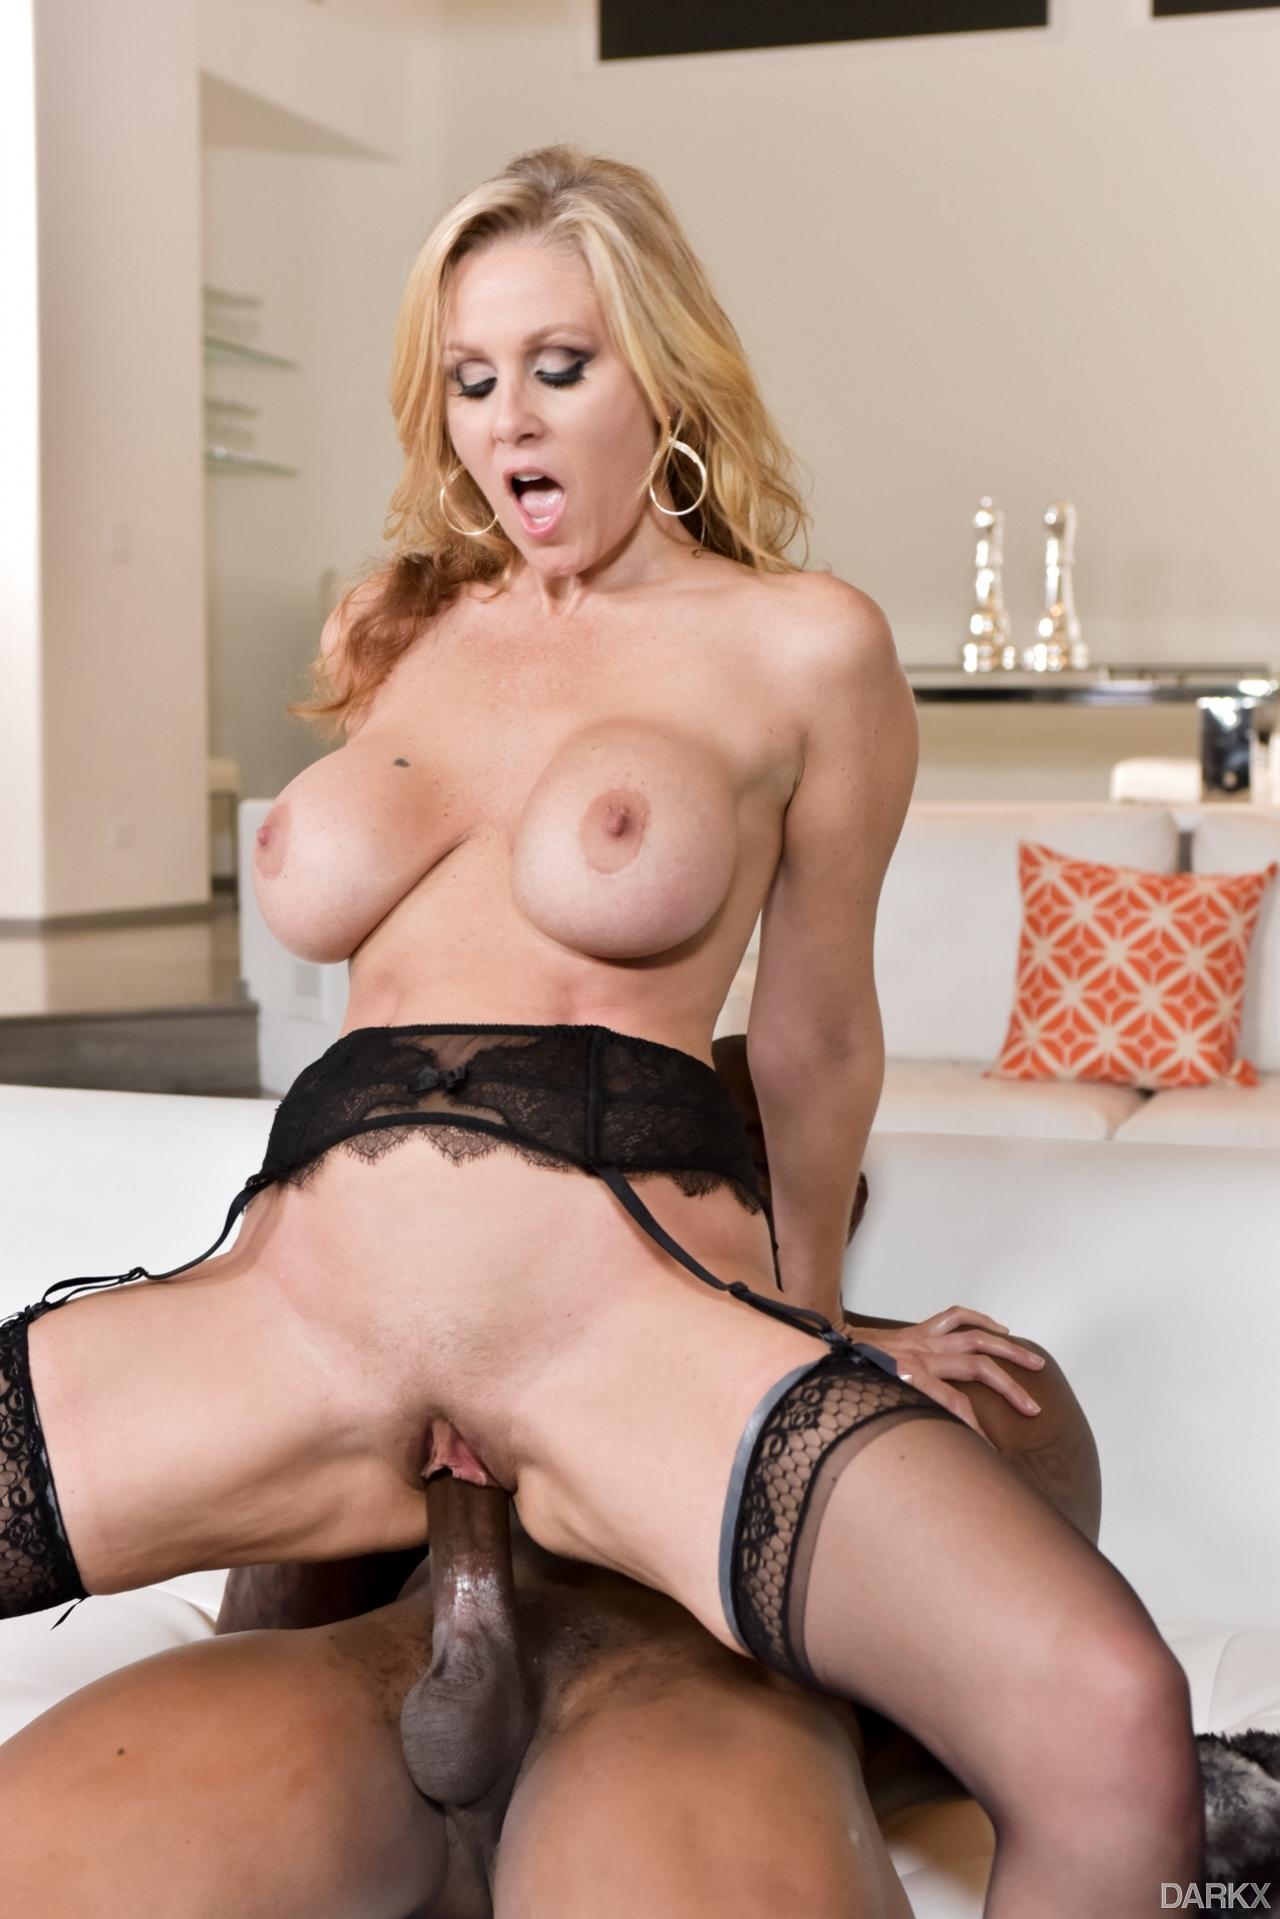 A Julia Ann le encanta el sexo interracial